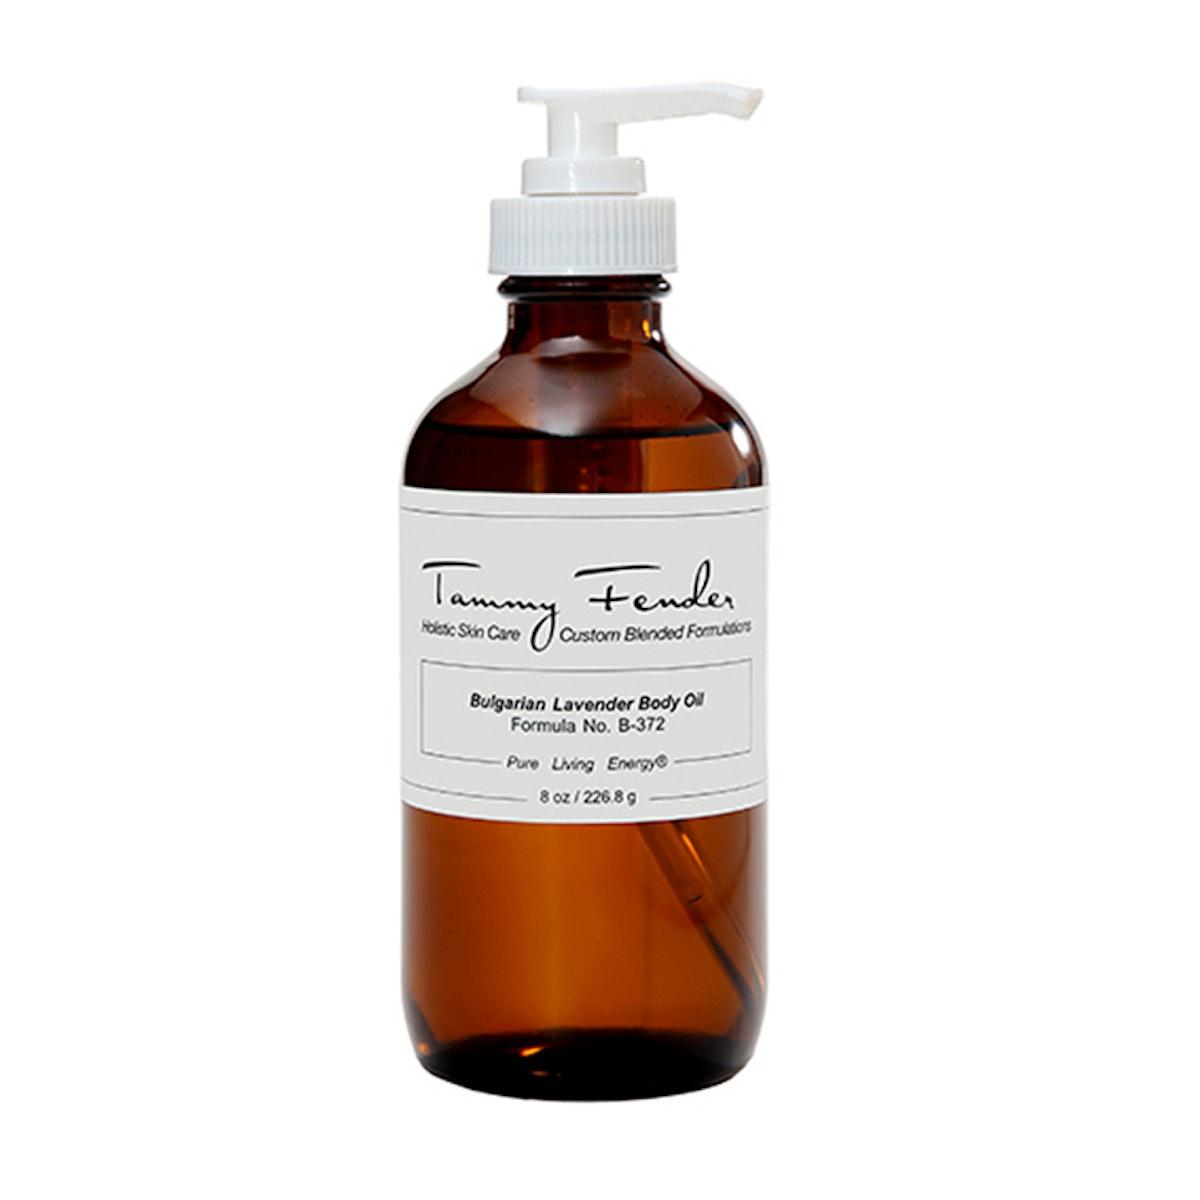 Bulgarian Lavender Body Oil | Formula No. B-374